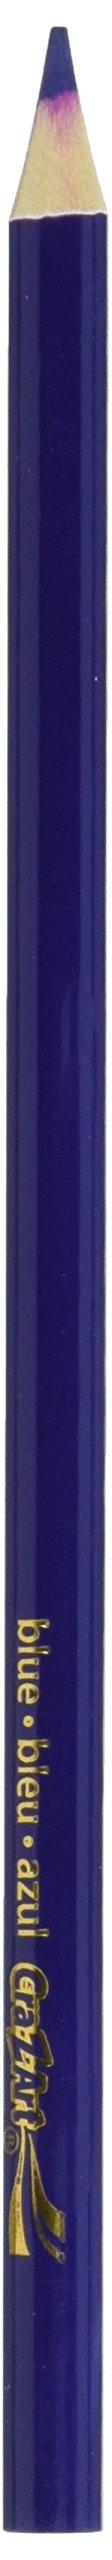 Cra-Z-Art Colored Pencil Set 36pc (Tamaño: 36 Count)